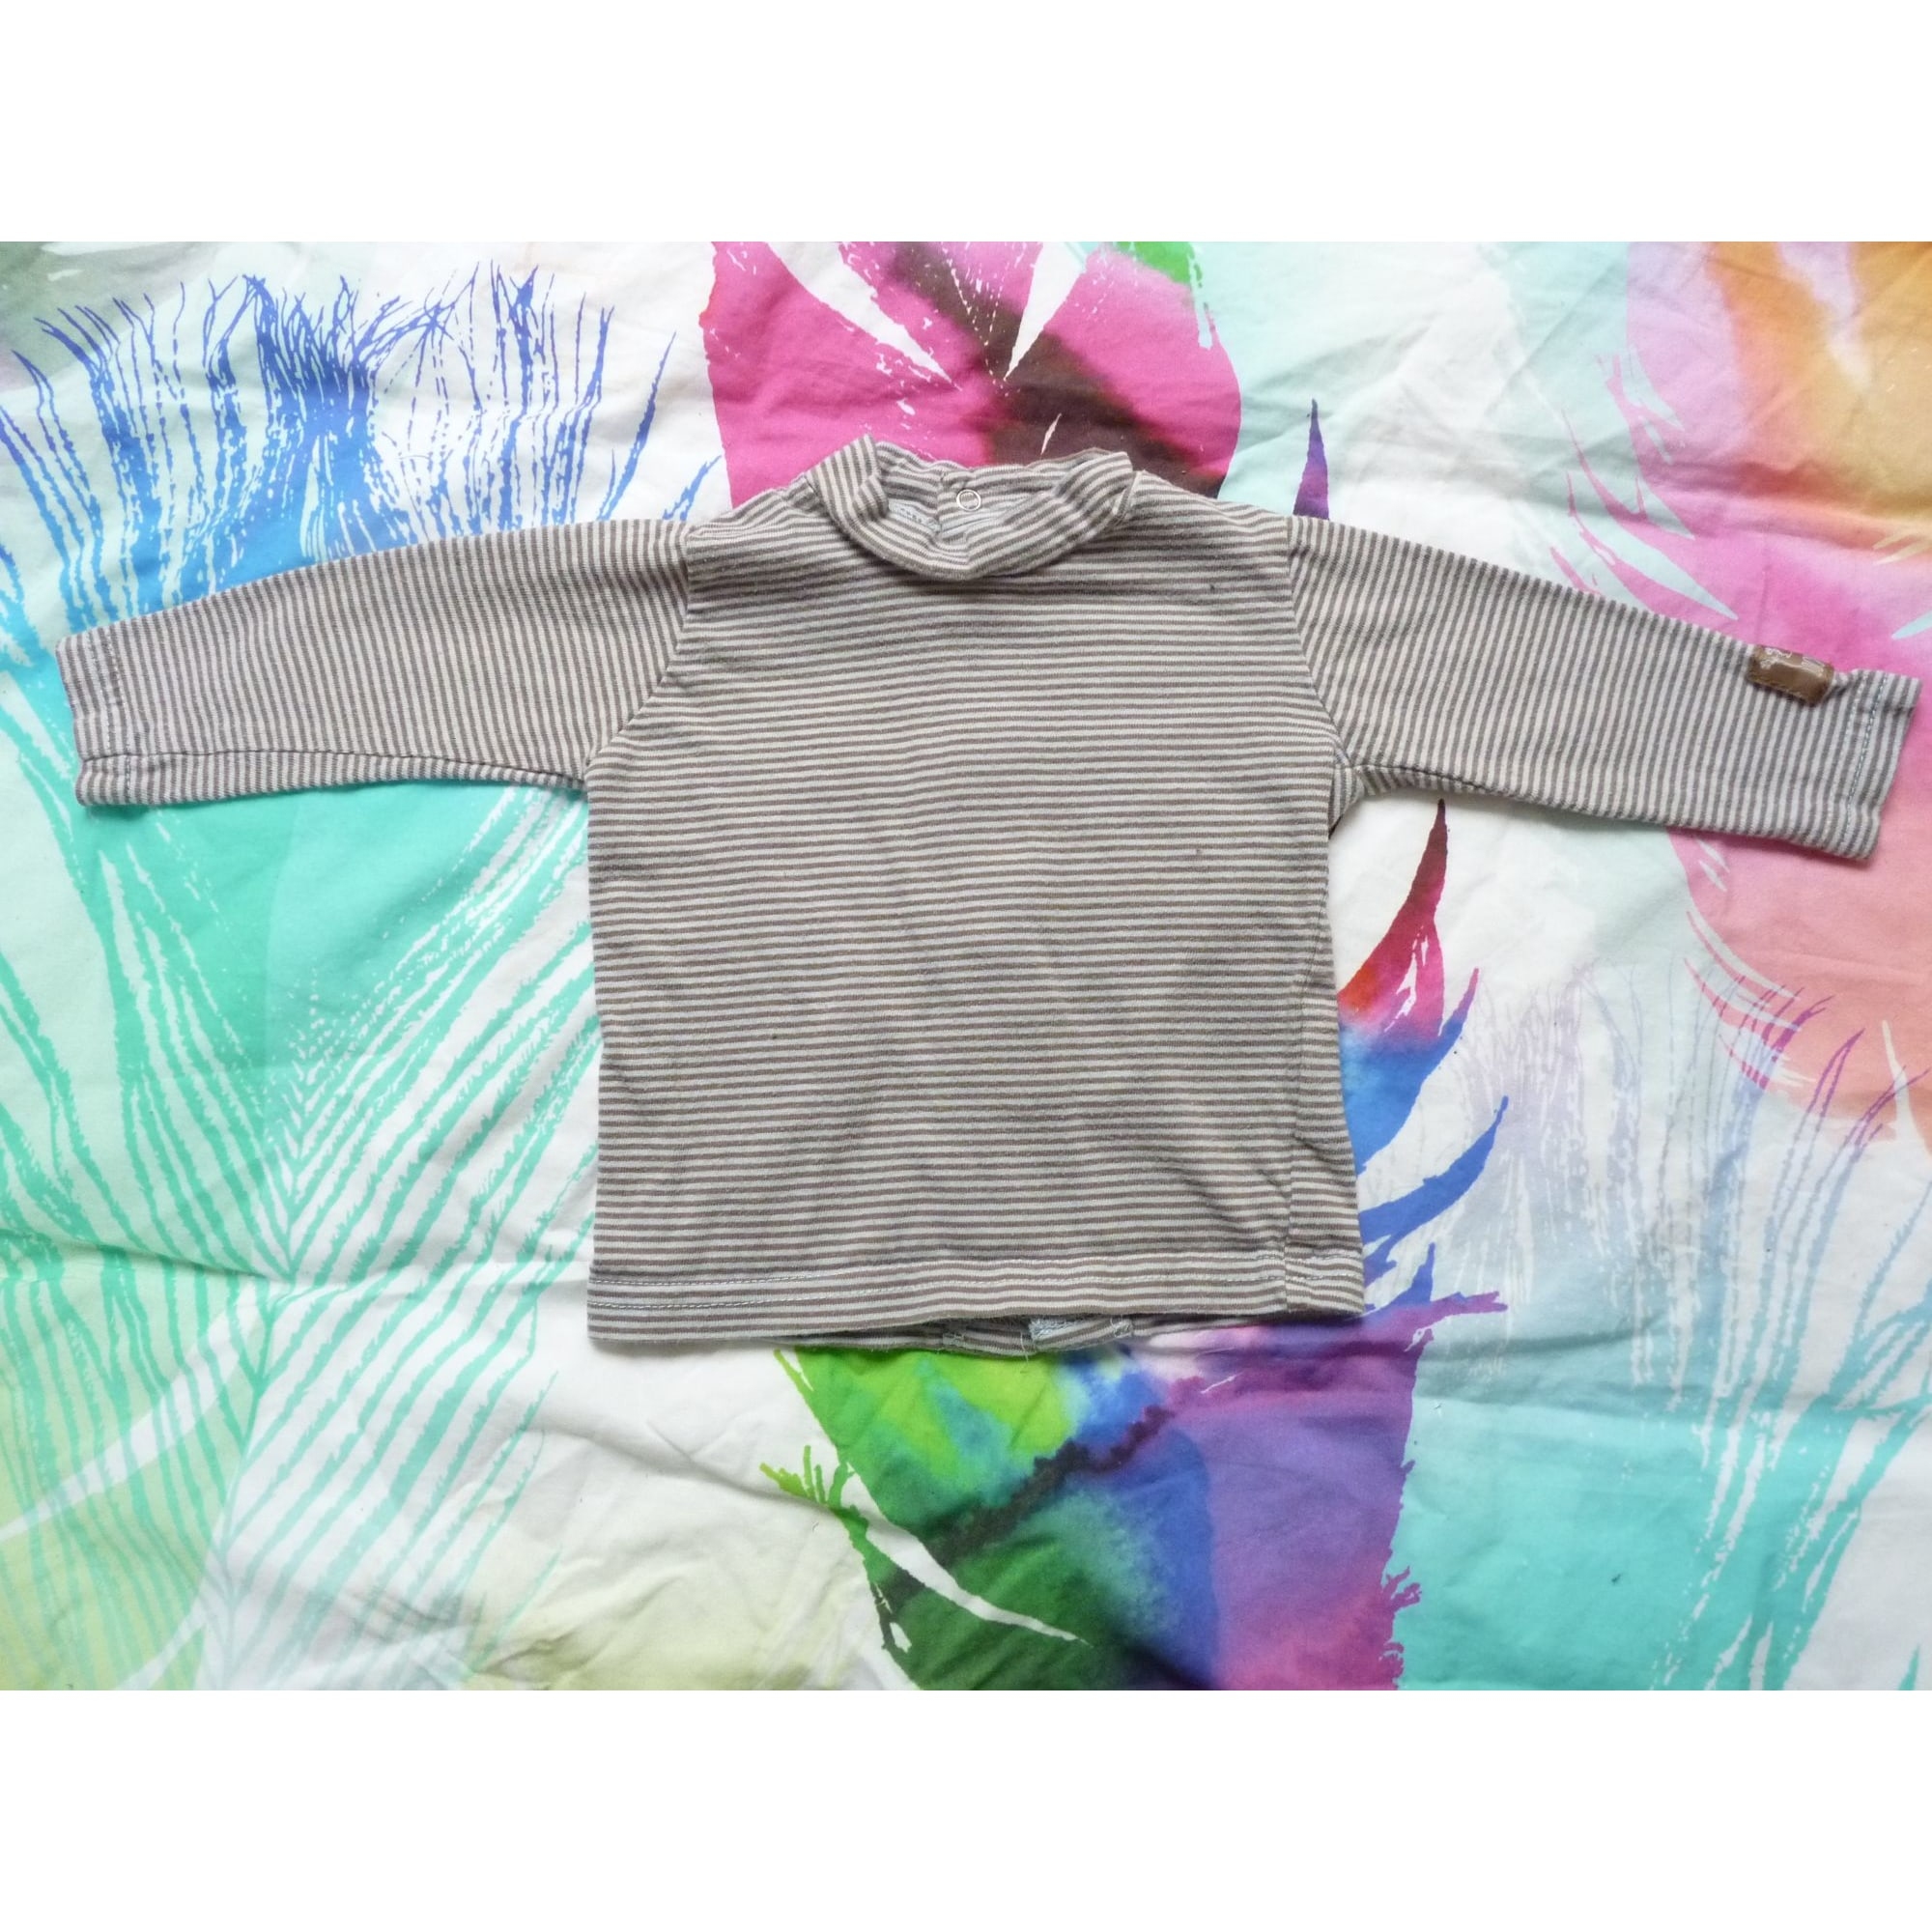 Top, tee shirt GRAIN DE BLÉ Beige, camel